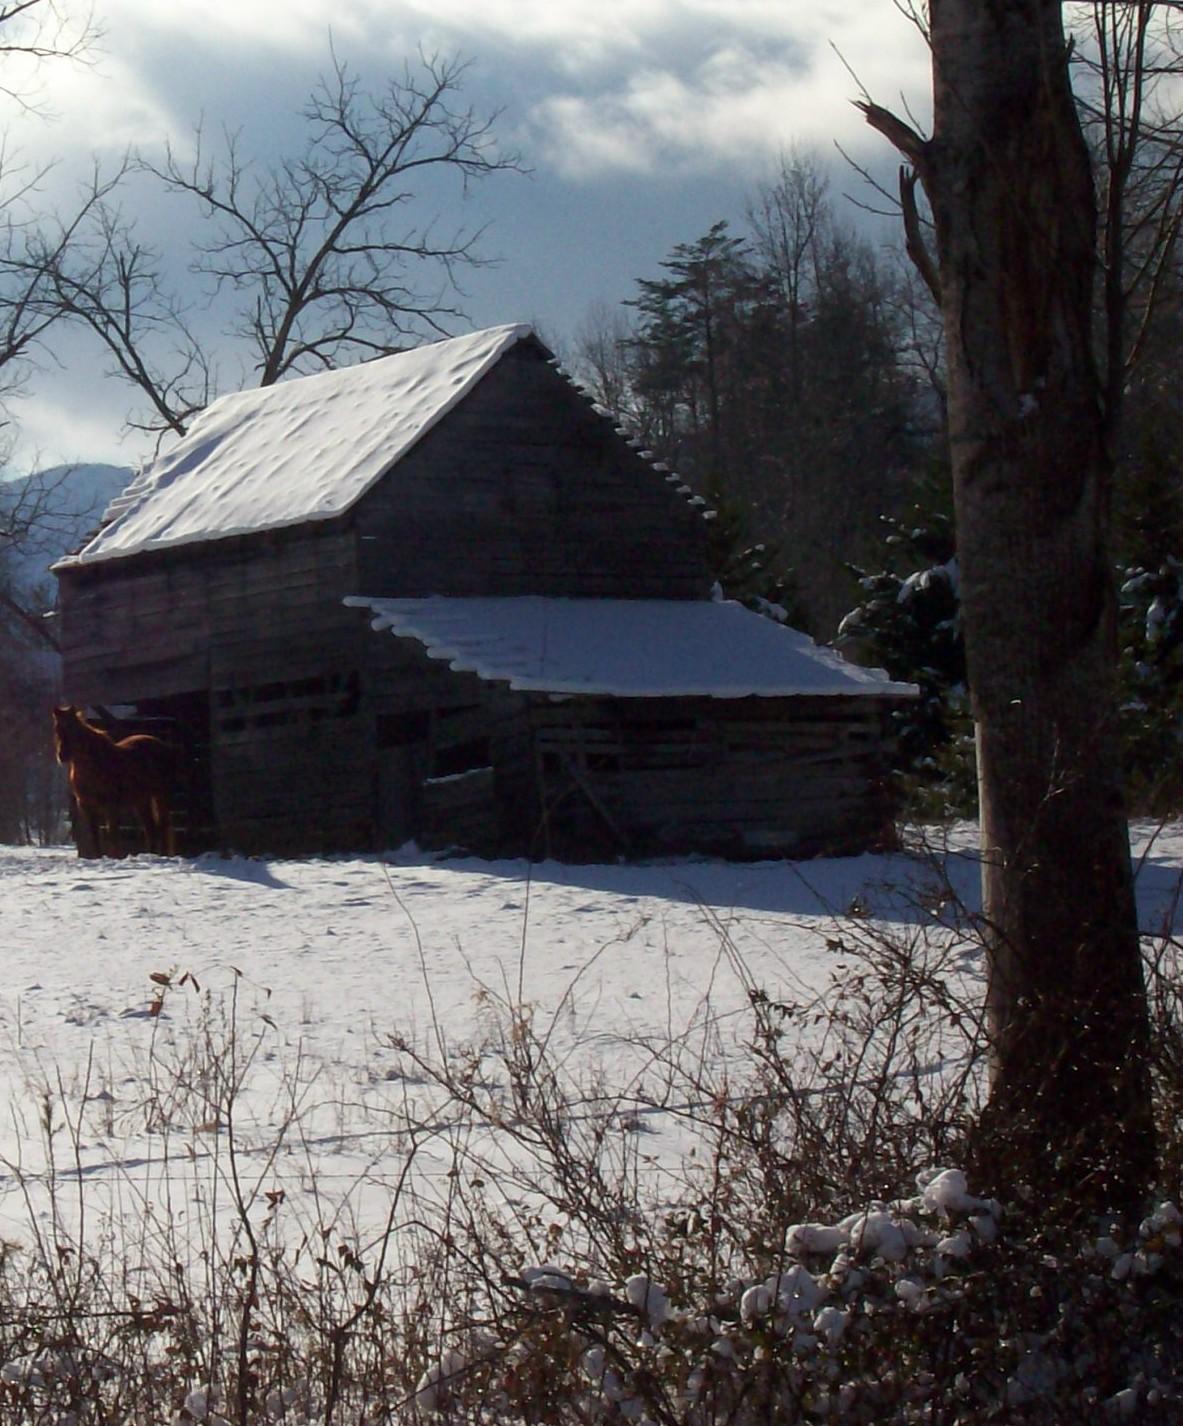 http://3.bp.blogspot.com/_8WaRFqx8enw/TRsolvRx37I/AAAAAAAAAdM/VPLz5cb5GjQ/s1600/horse+barn+III.jpg